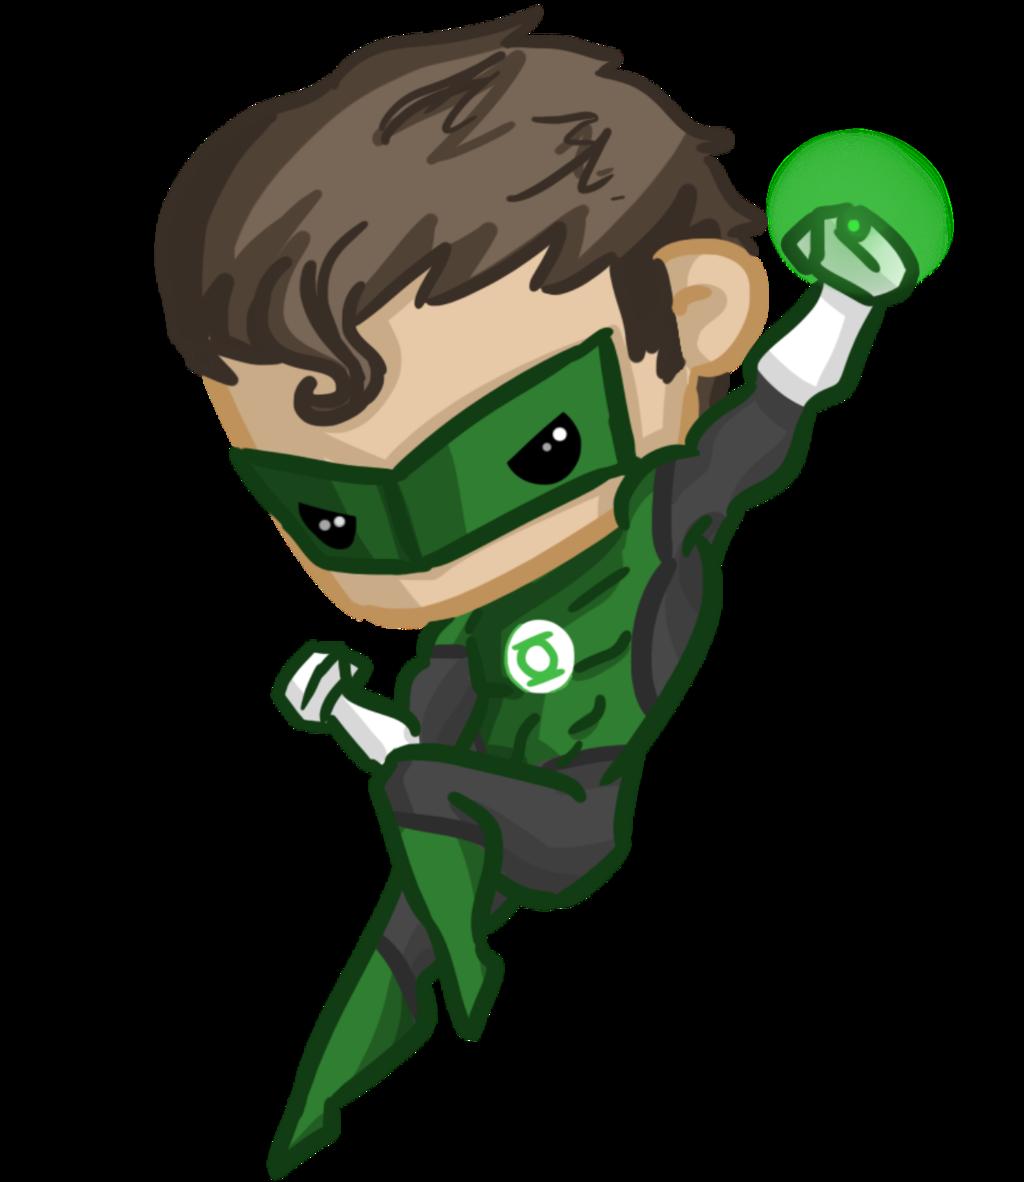 Lantern clipart baby green Jordan lantern deviantart Jordan Ijen